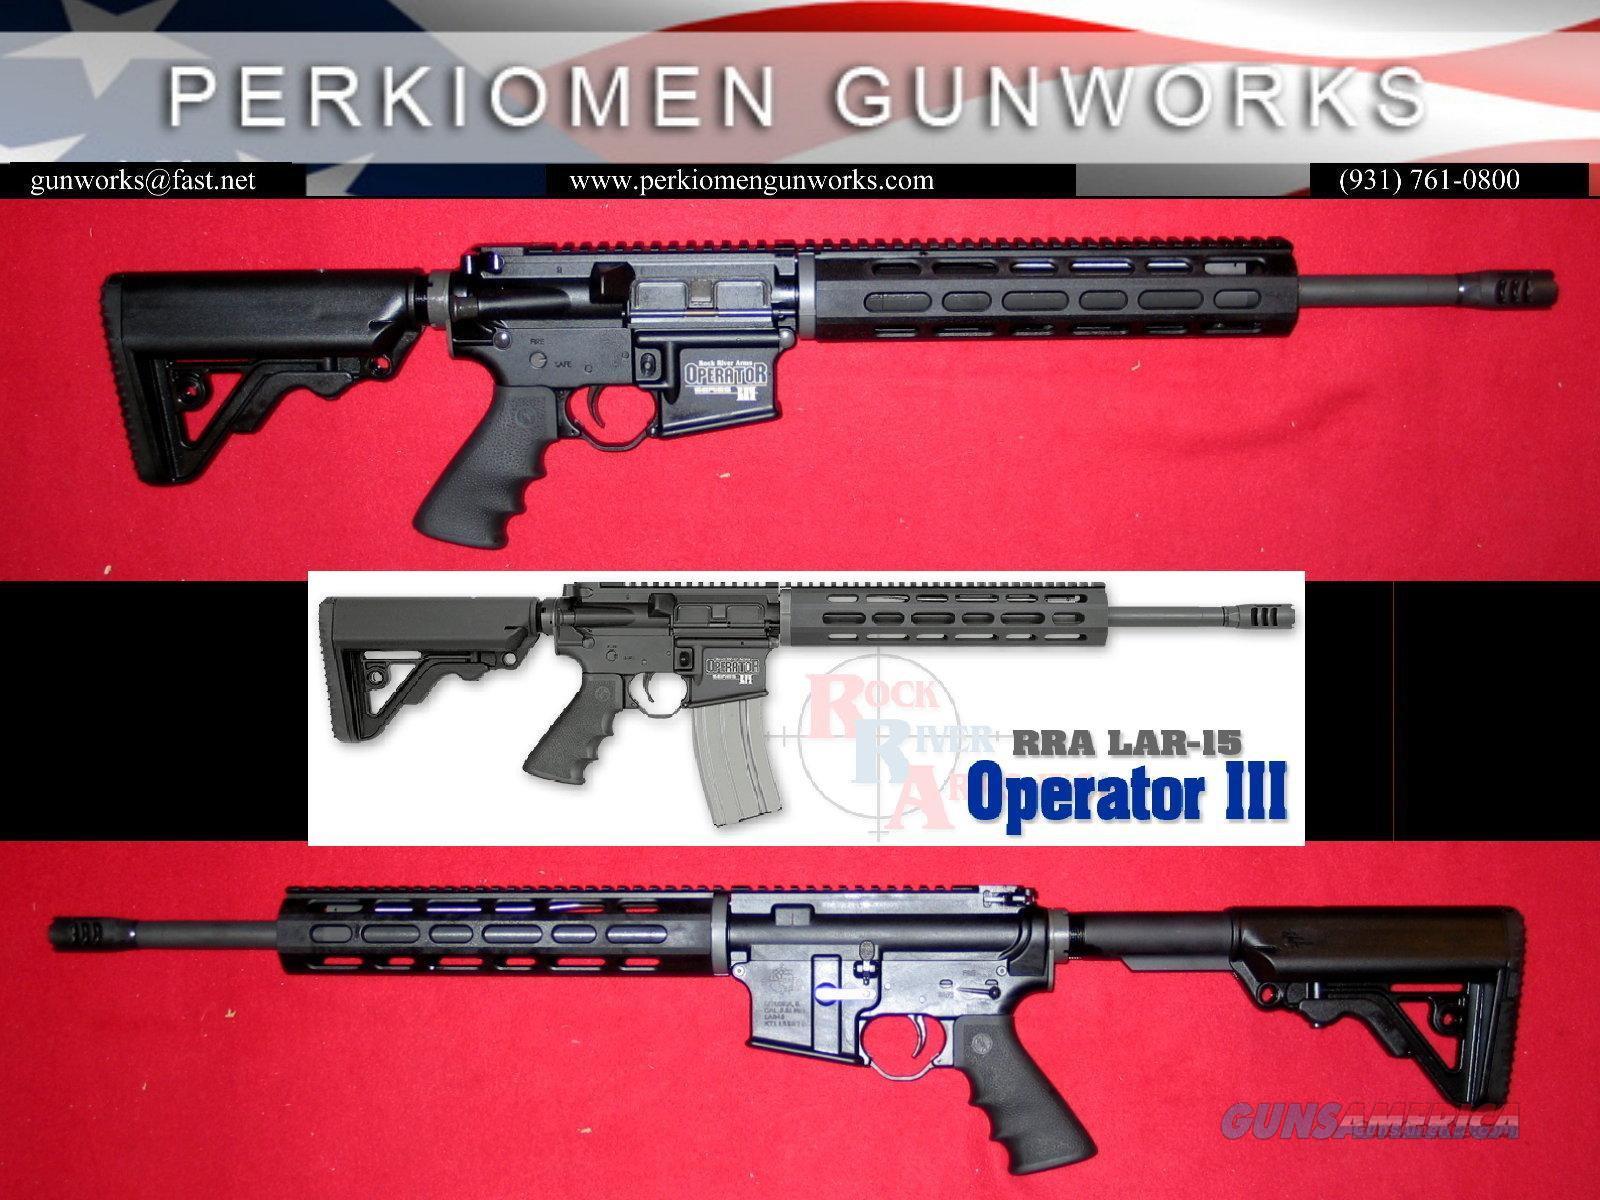 Operator III LAR-15 5.56/.223 Rifle - New in Box  Guns > Rifles > Rock River Arms Rifles